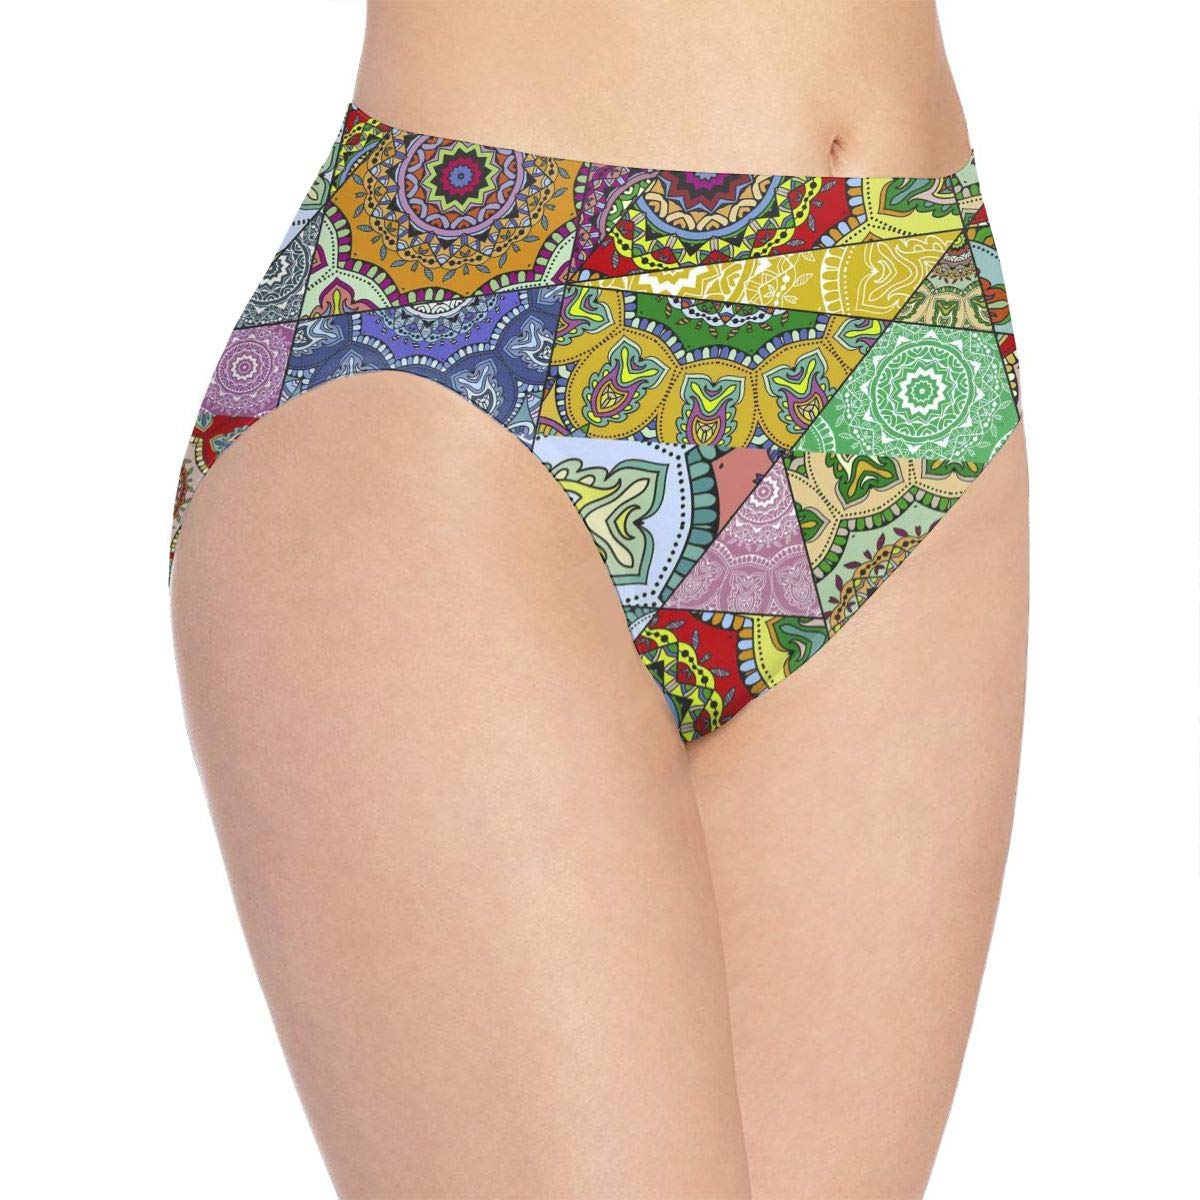 Eplus Womens Diverse Prints Underwear Hipster Bikini Briefs Panties